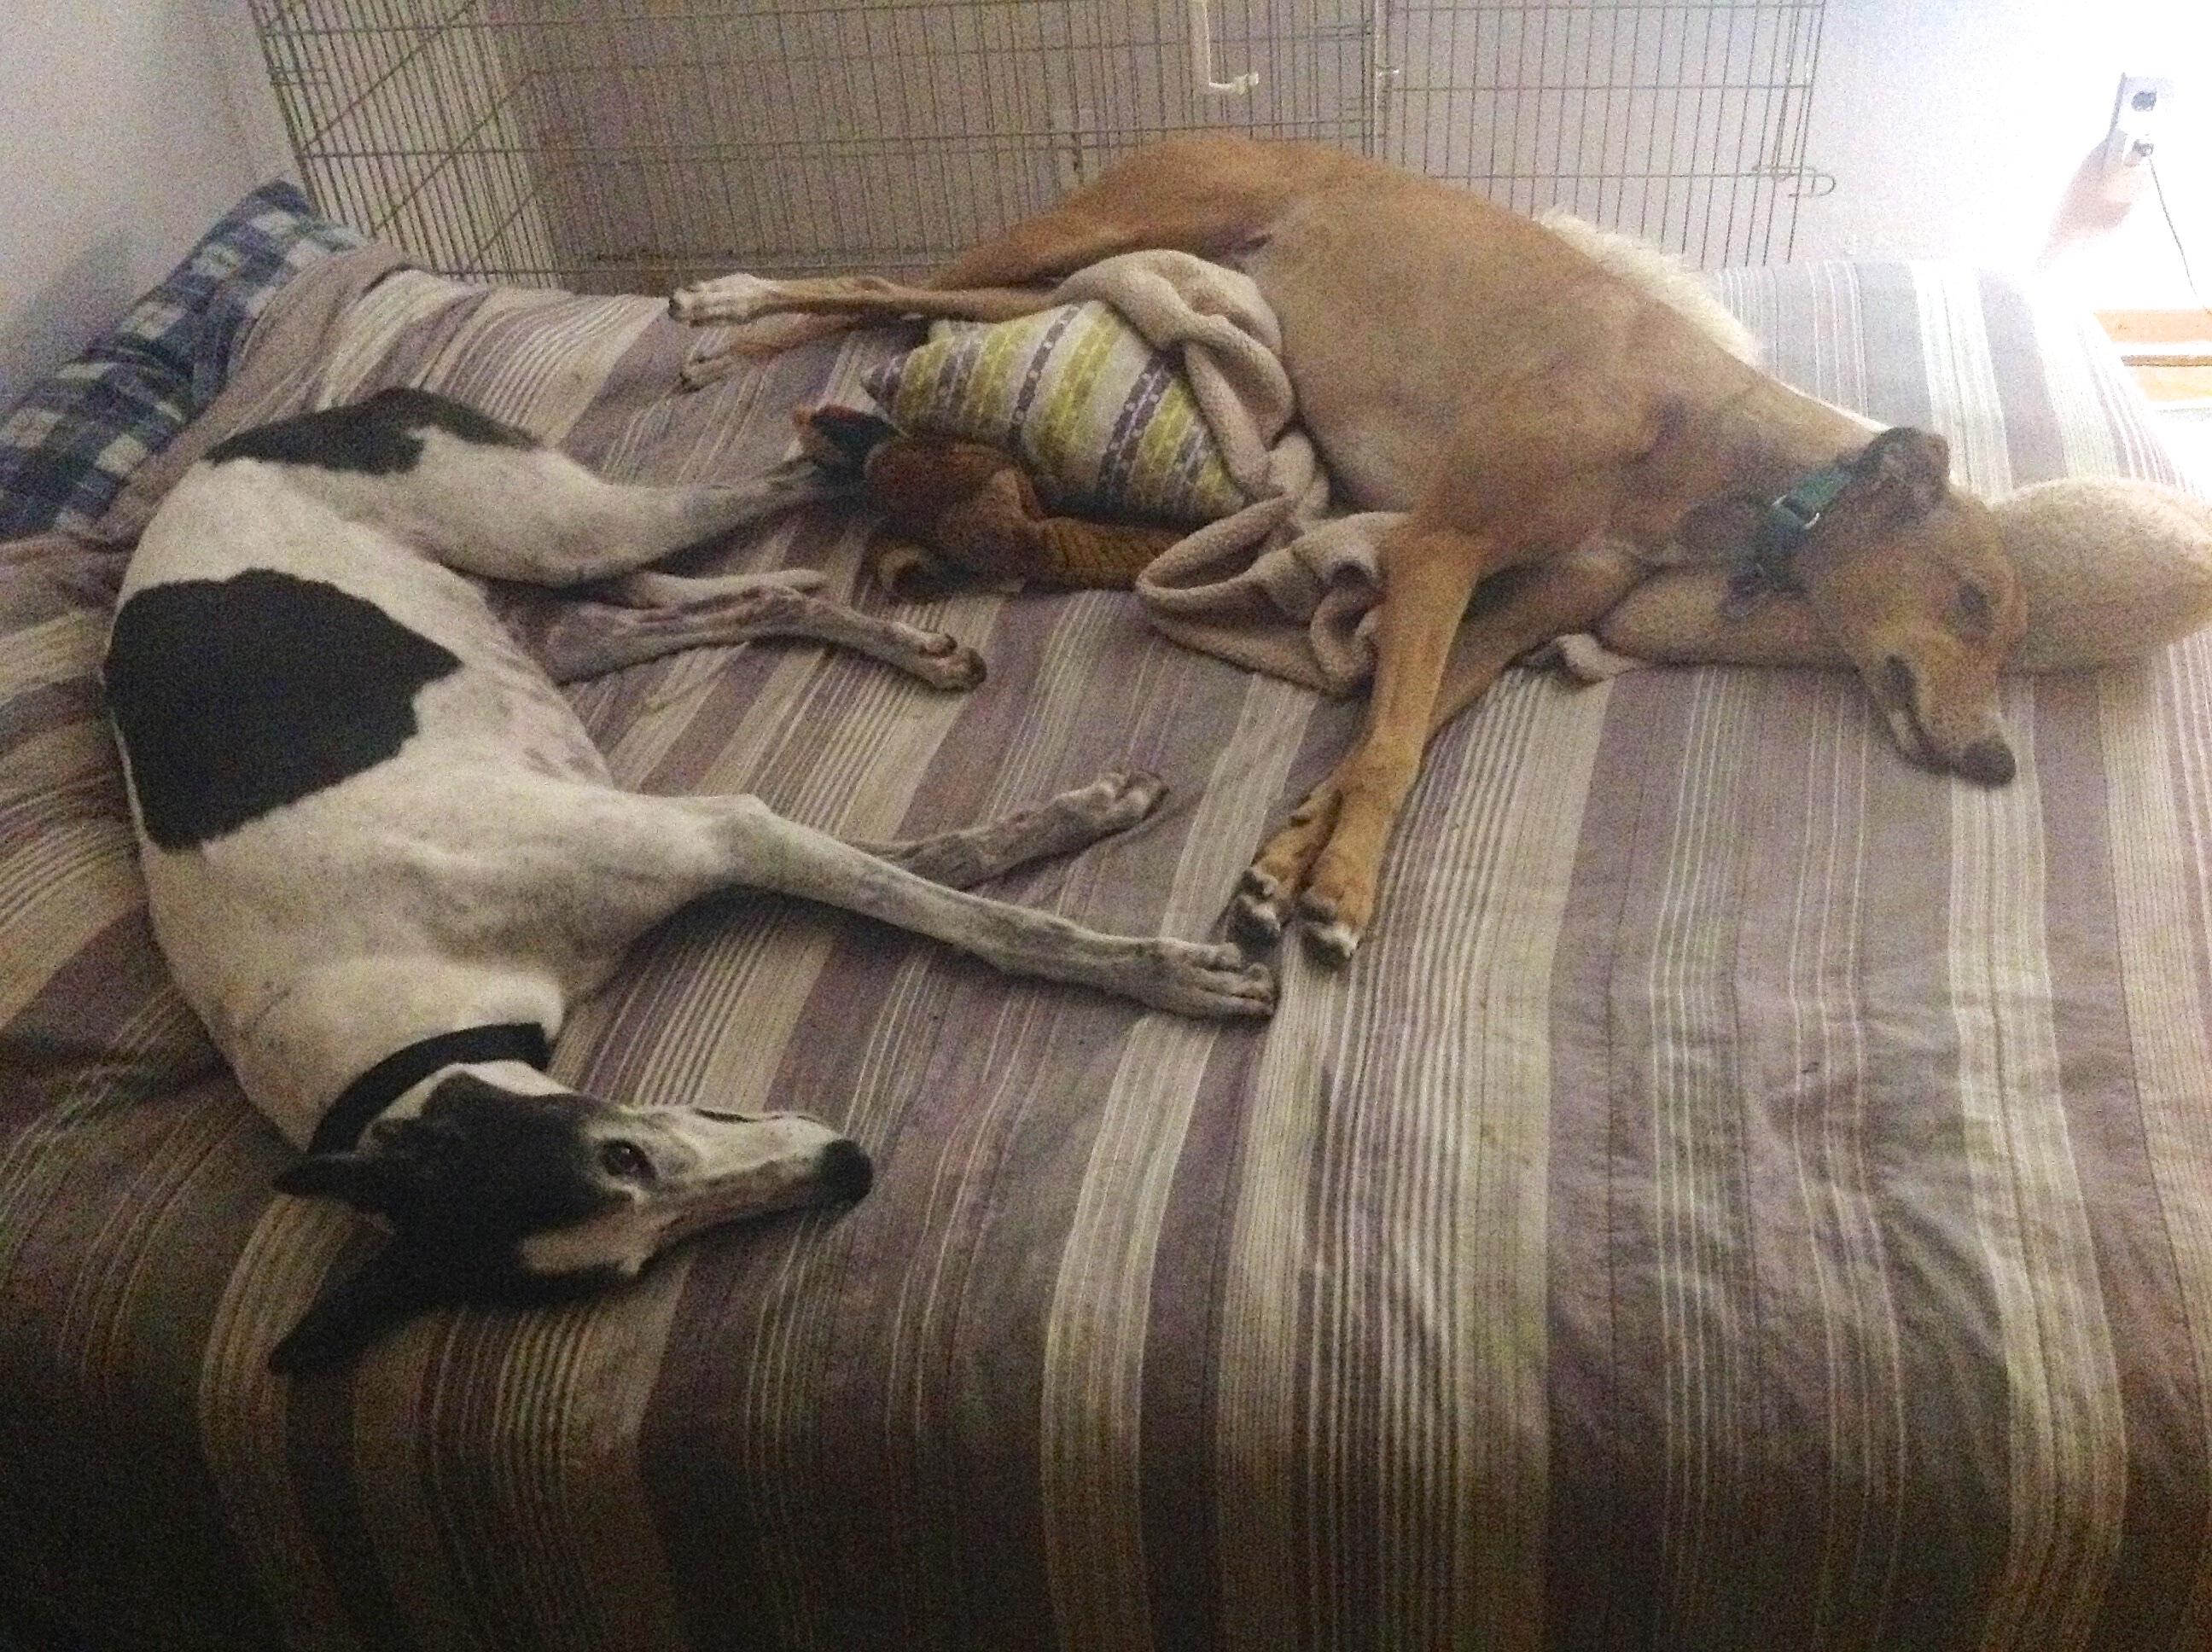 Dog Bed Hogs